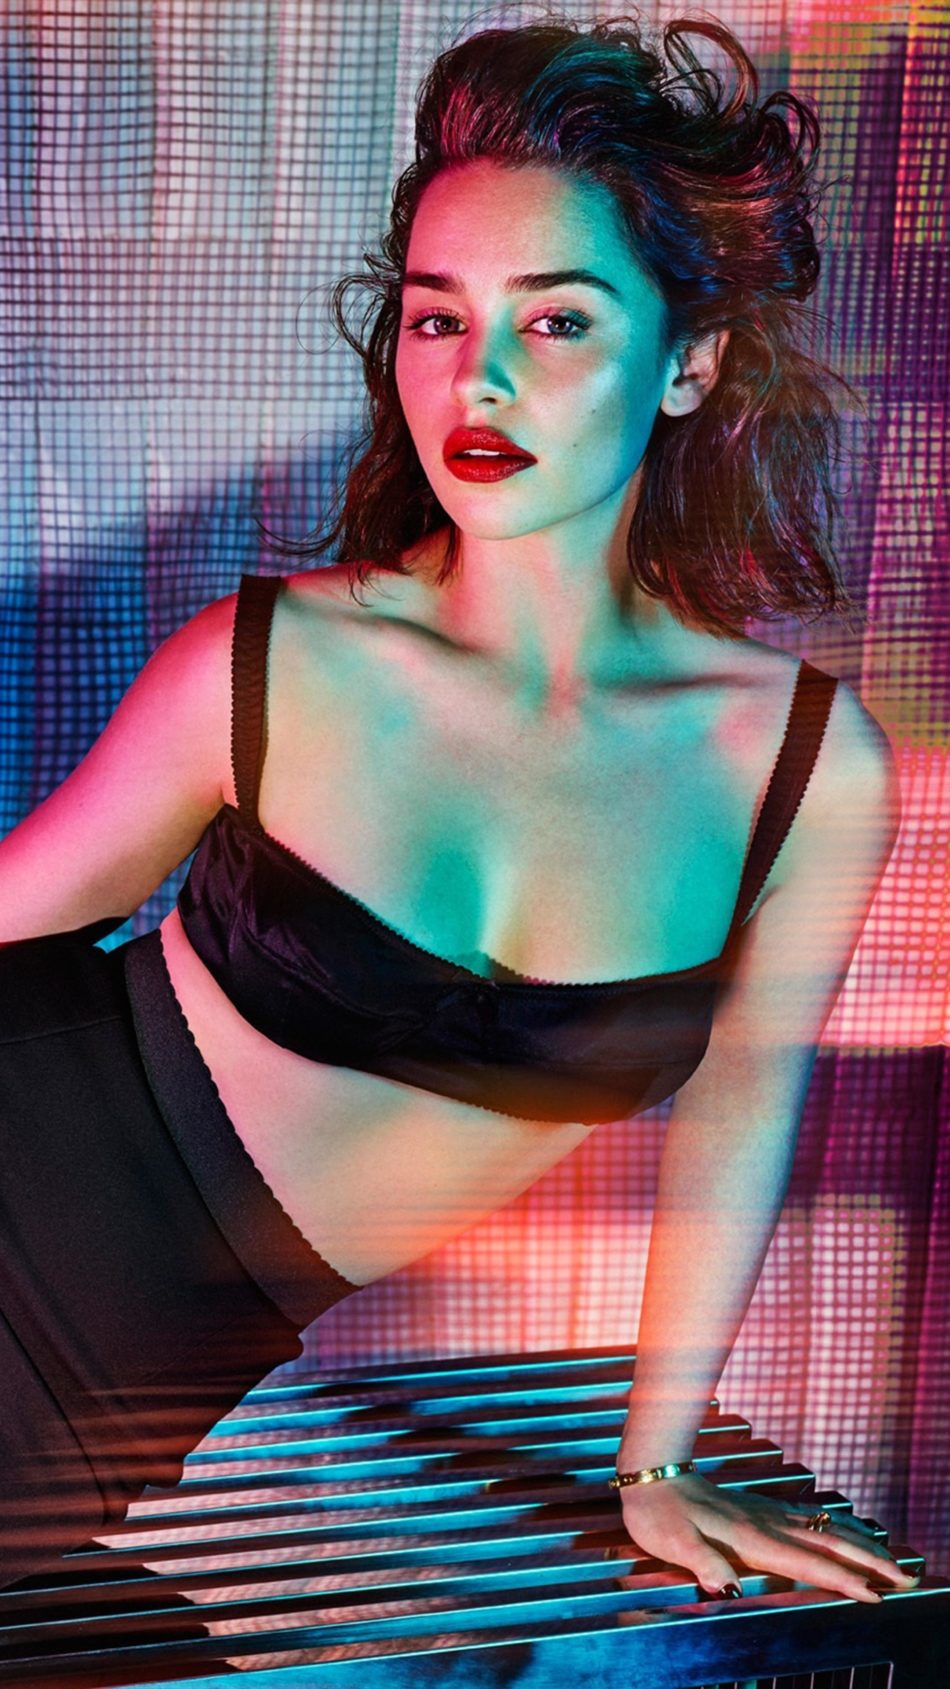 Actress Emilia Clarke 2020 4K Ultra HD Mobile Wallpaper